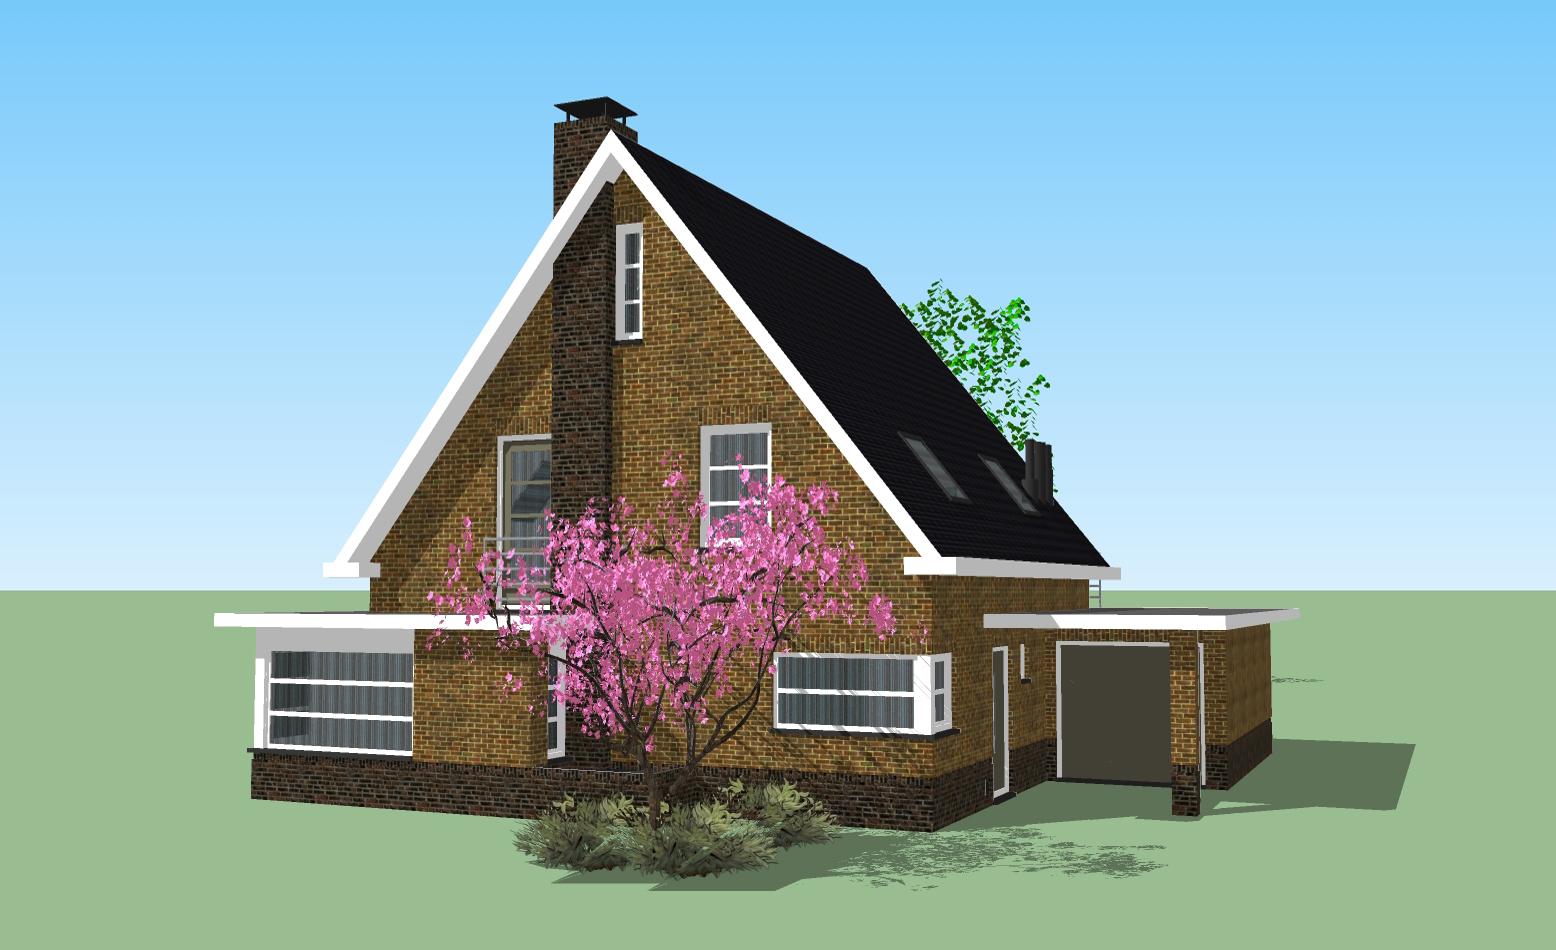 Huis q u a d r a sketchup for Huizen tekenen